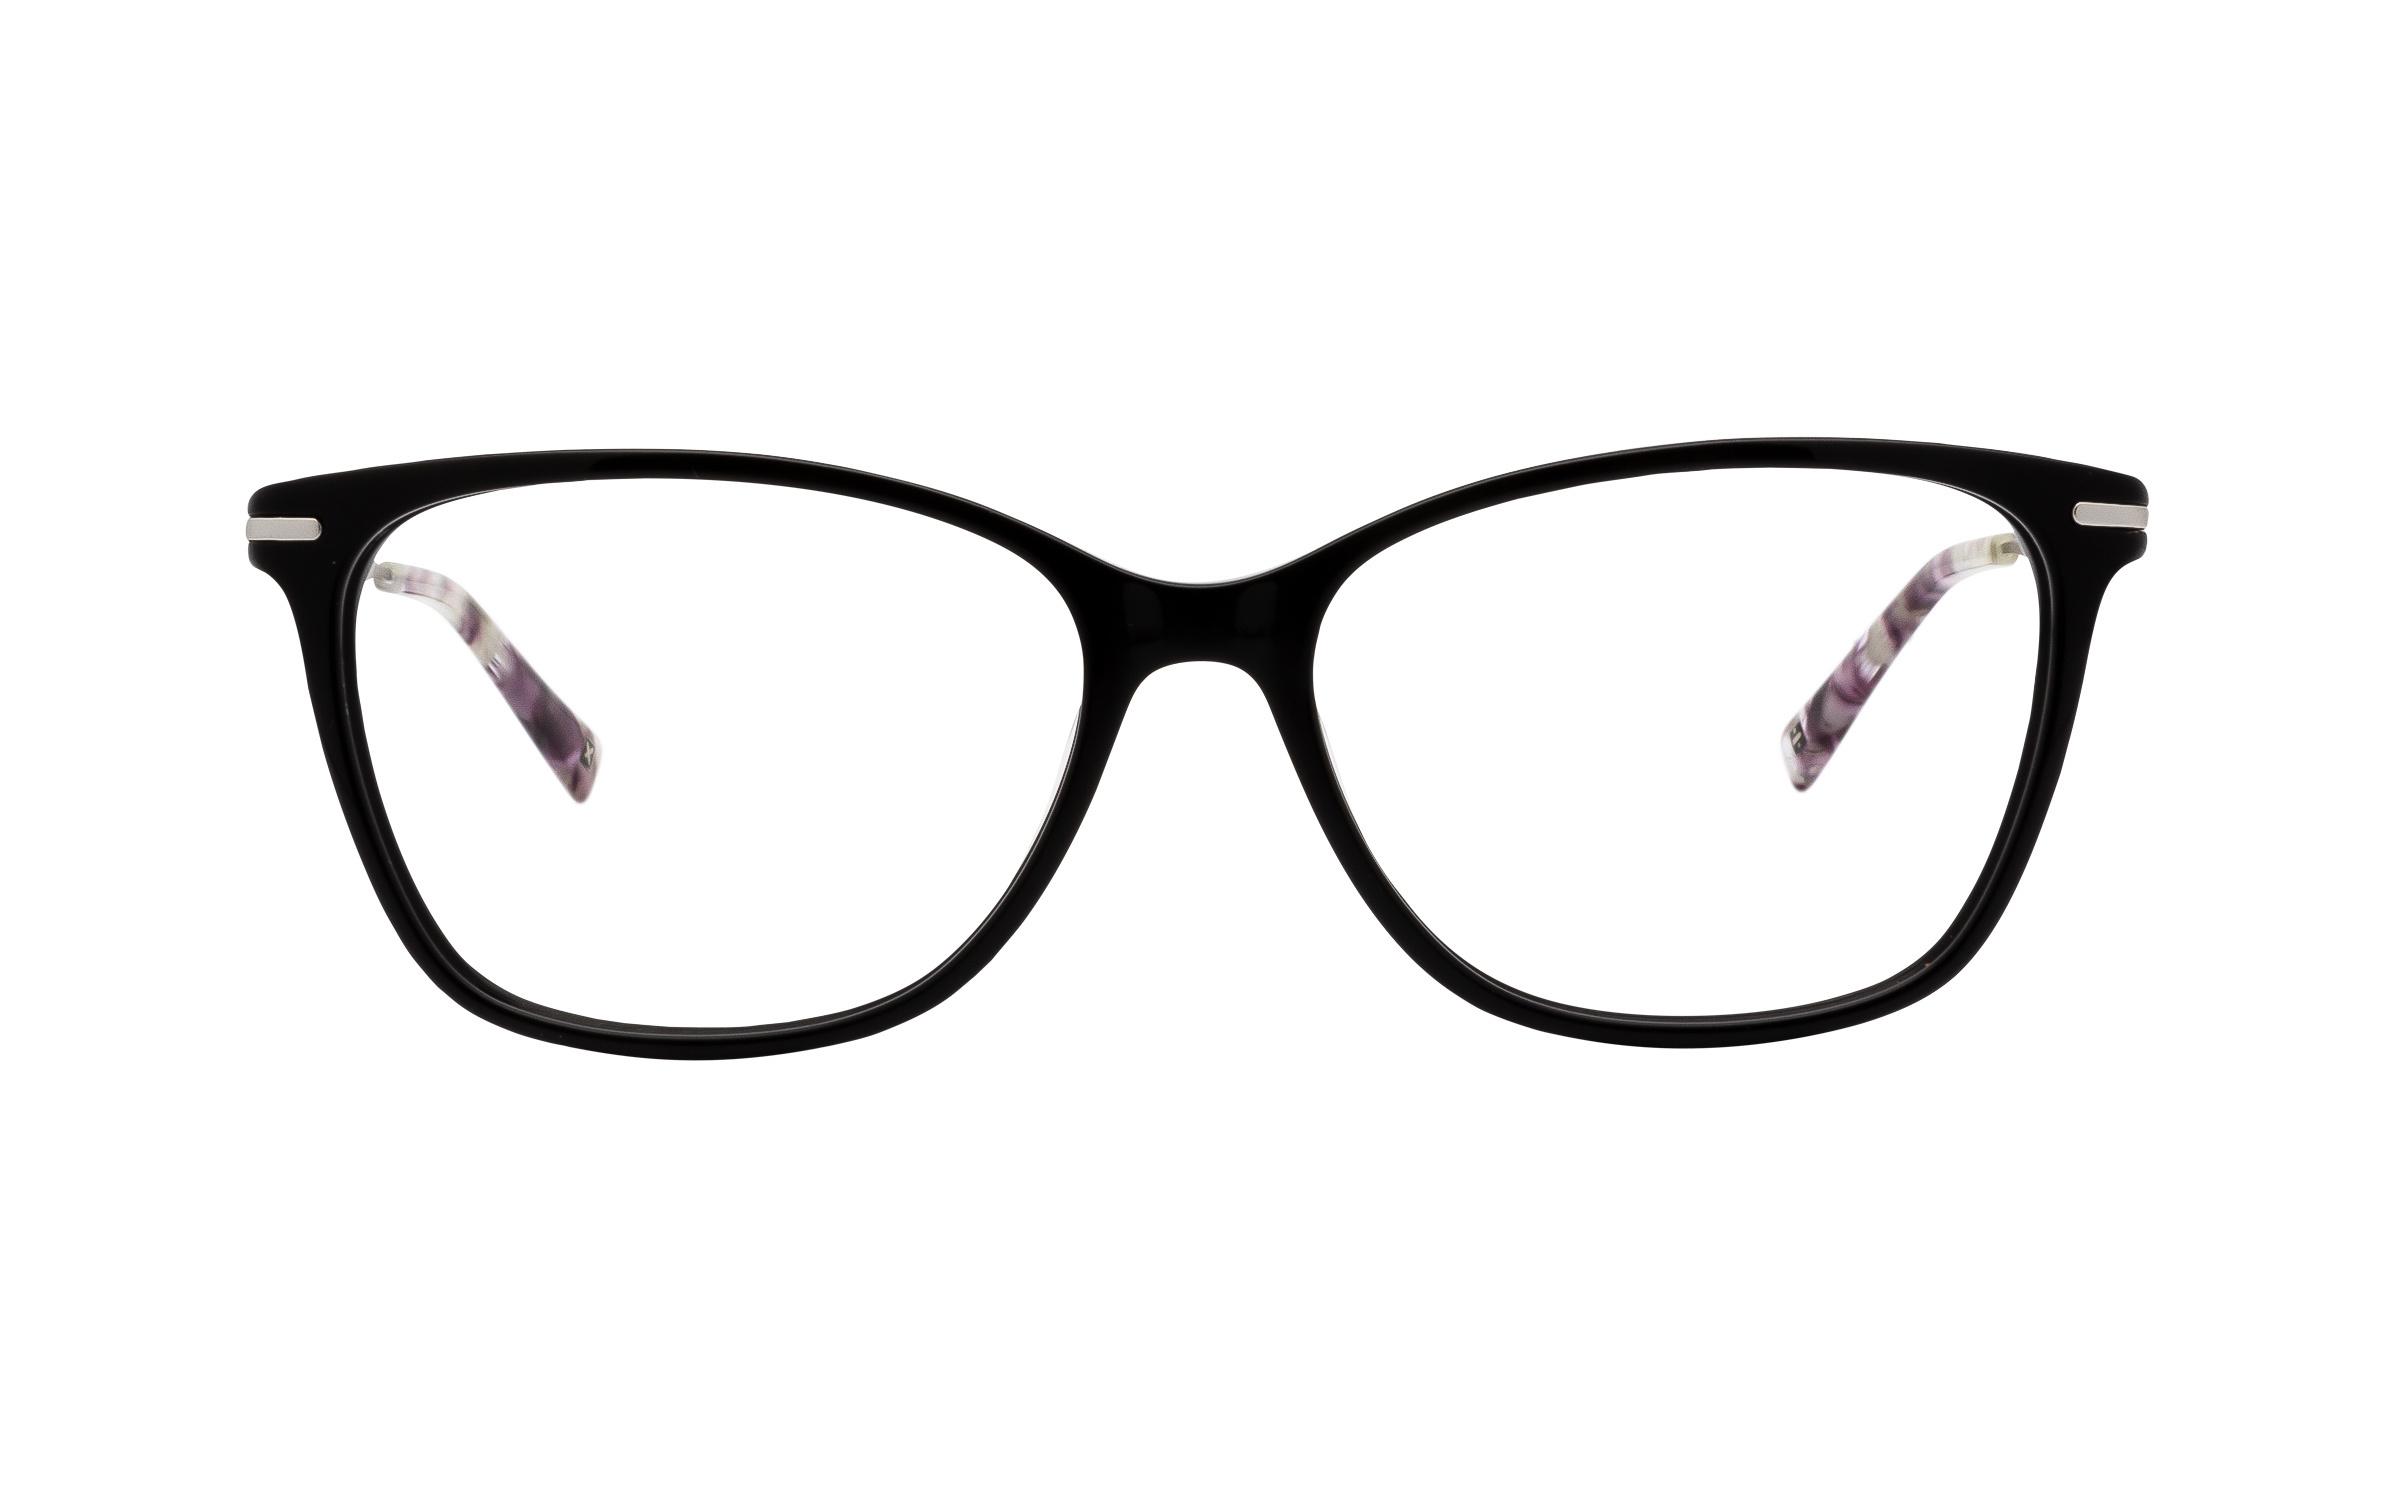 http://www.coastal.com/ - Derek Cardigan Pictor DC231 C01 (54) Eyeglasses and Frame in Shiny Black | Acetate/Metal – Online Coastal